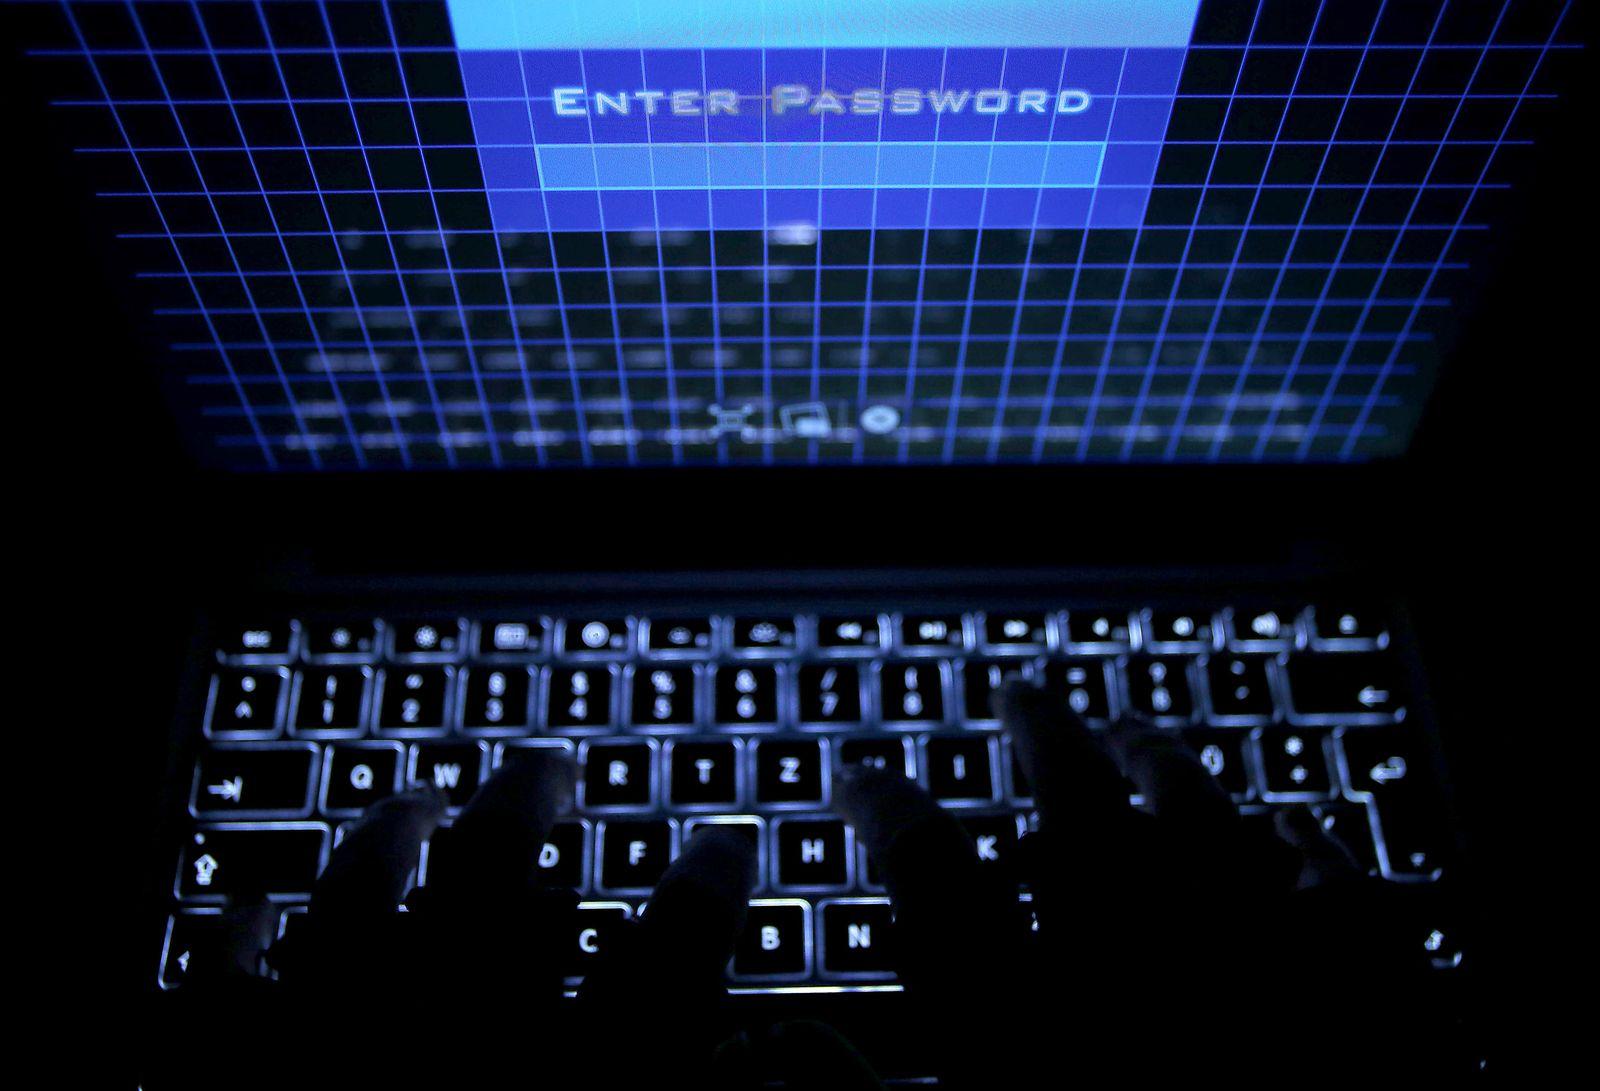 Computerkriminalität Passwort